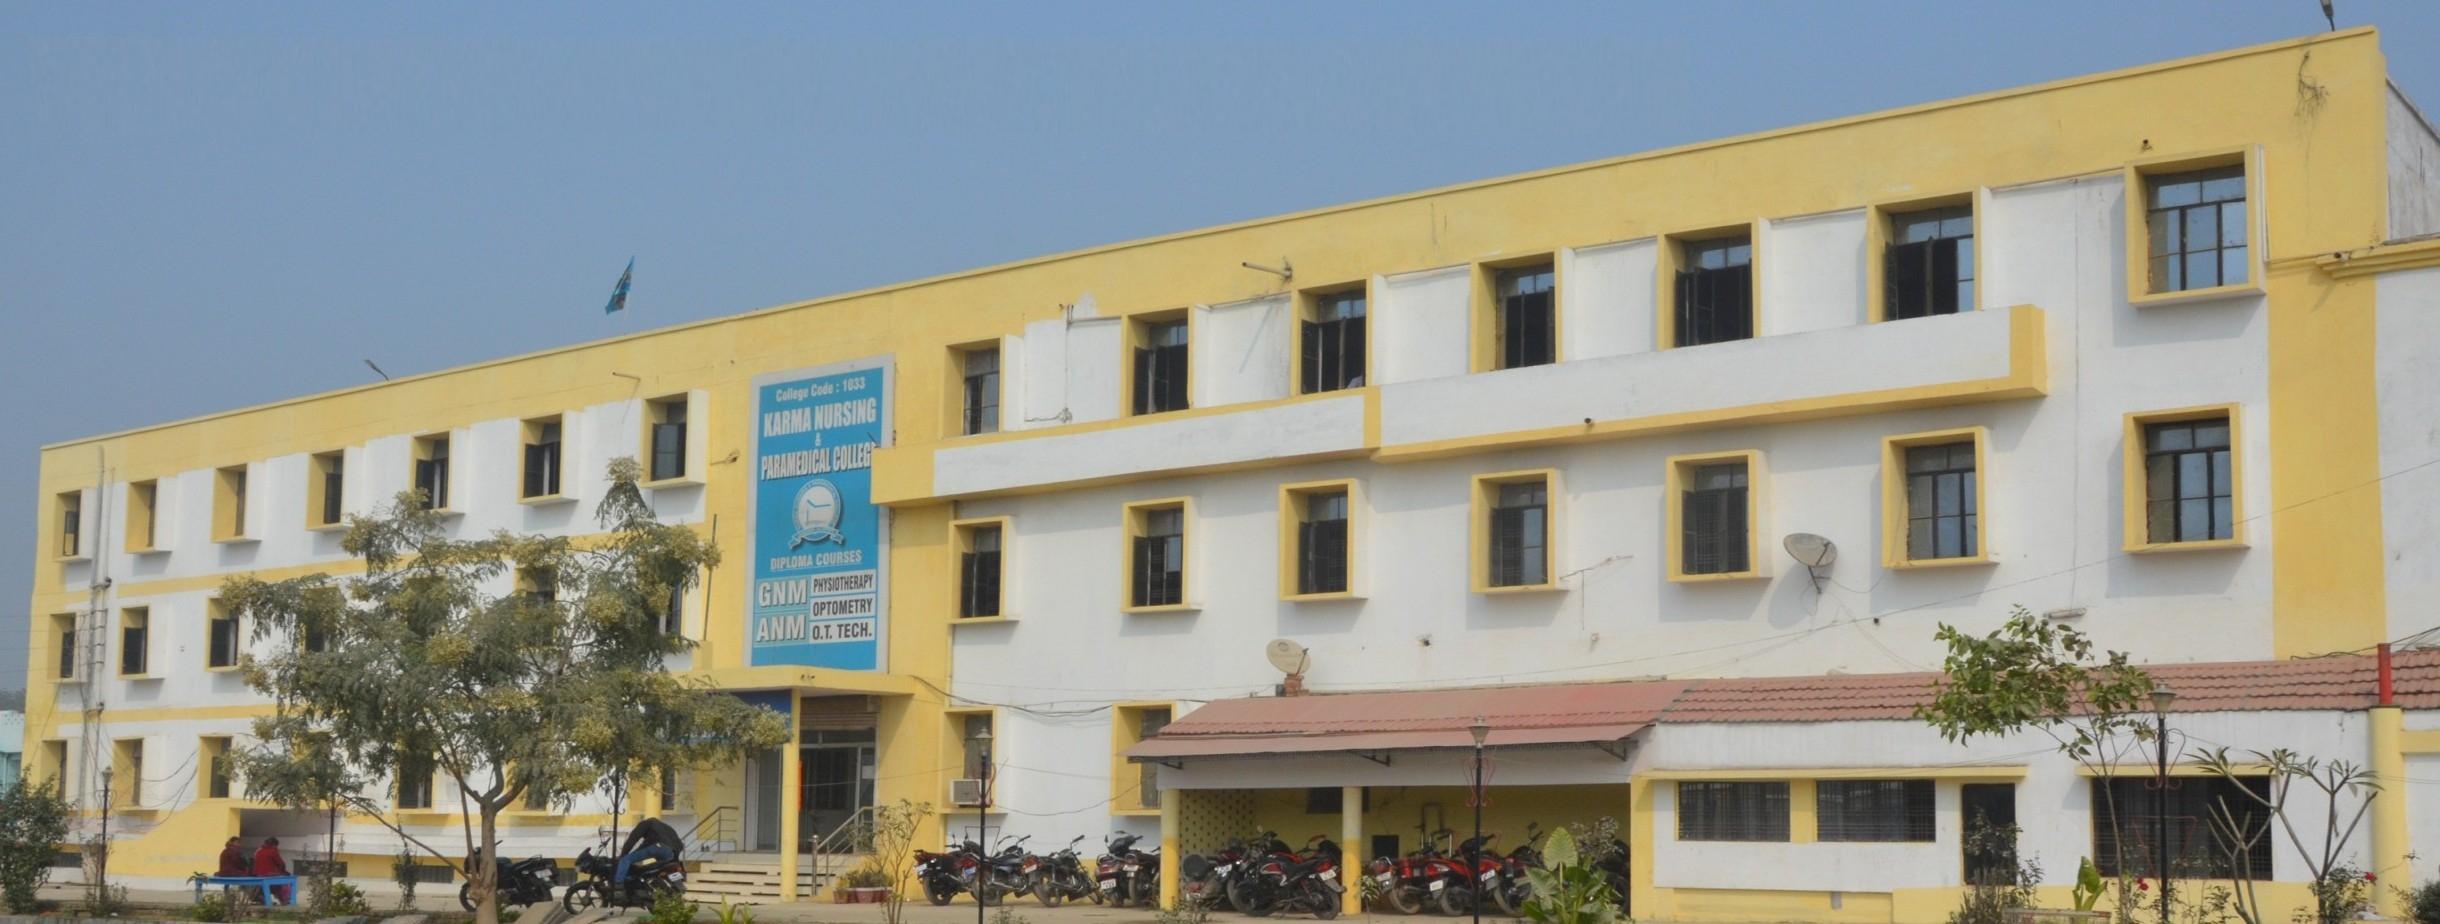 Karma Nursing and Paramedical College Image